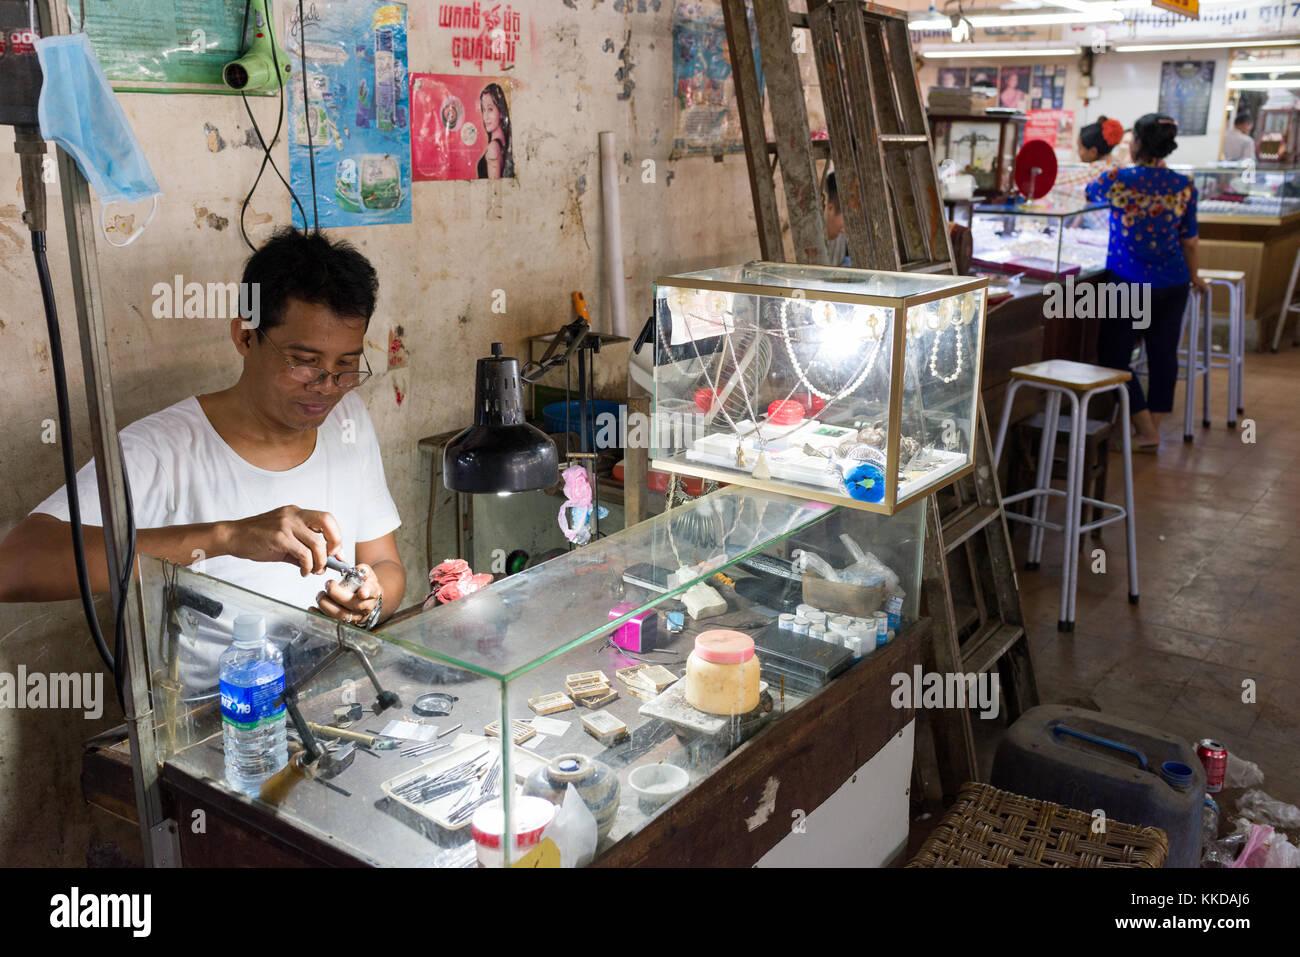 A jeweller at work in  Phsar Nath Market, Battambang, Cambodia - Stock Image